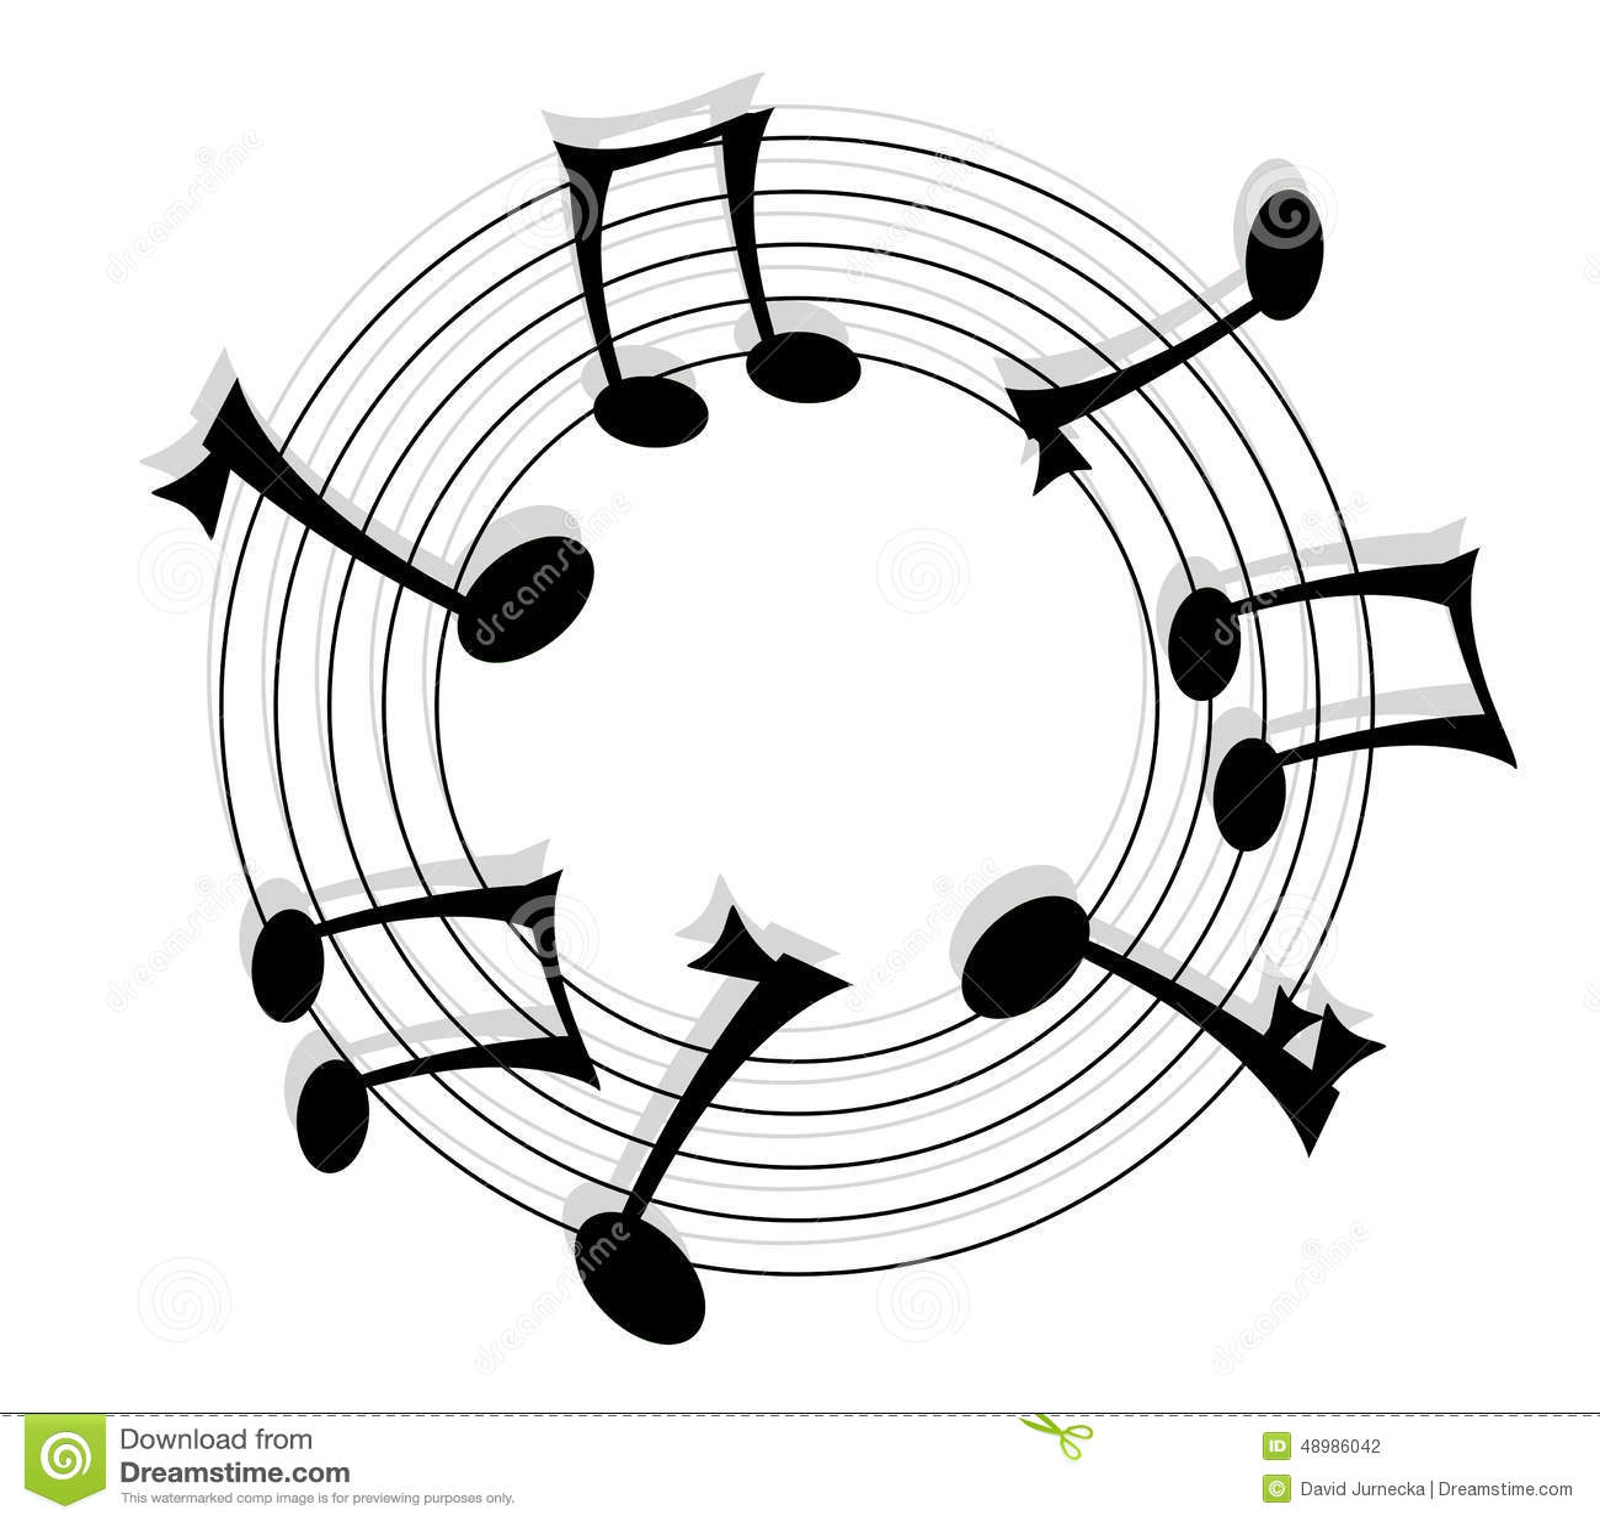 music notes stock illustration image 48986042